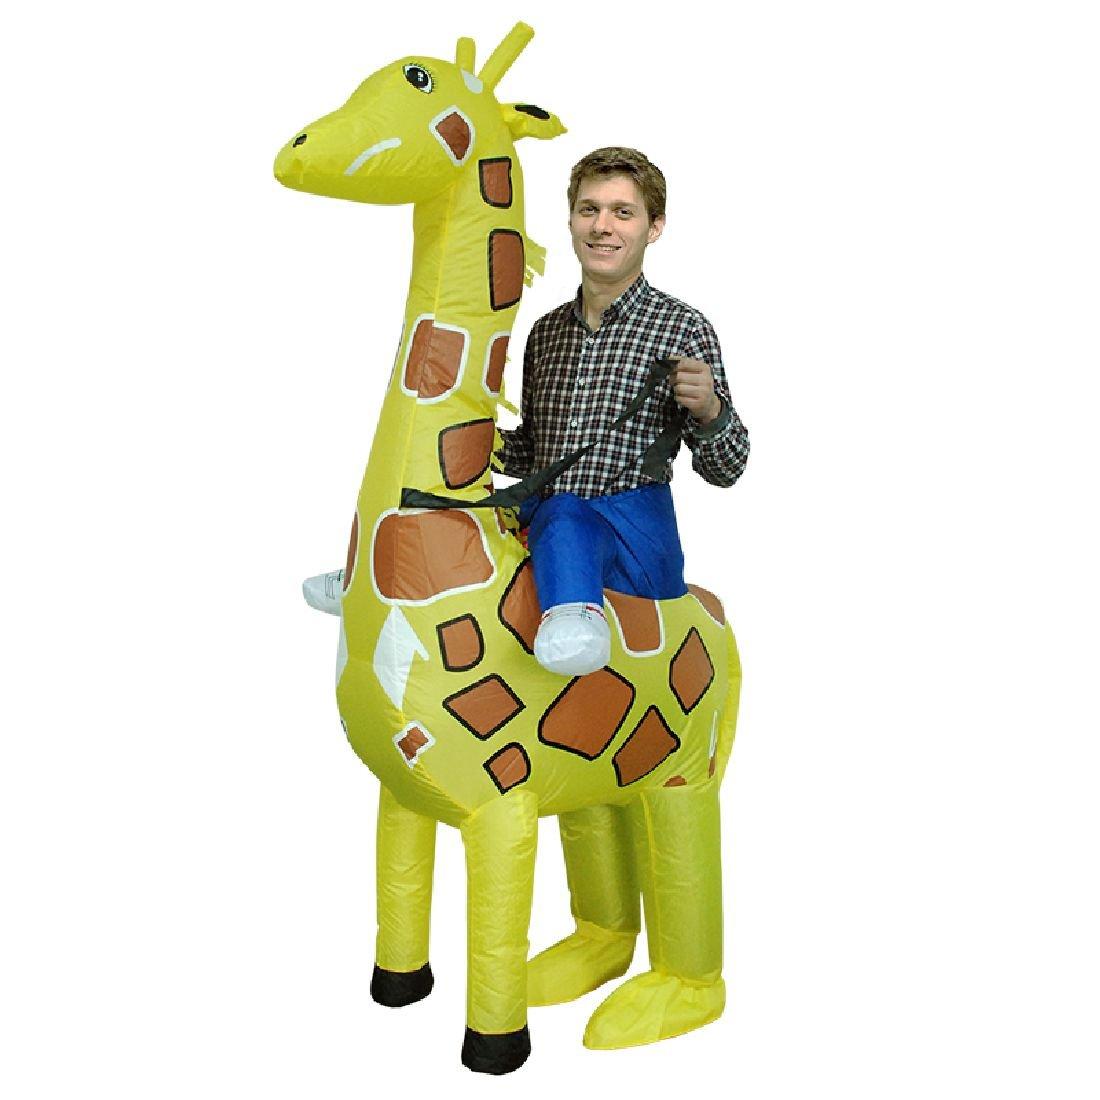 Adult Ride Giraffe Costume Woman Cosplay Giraffe Inflatable Dress Up